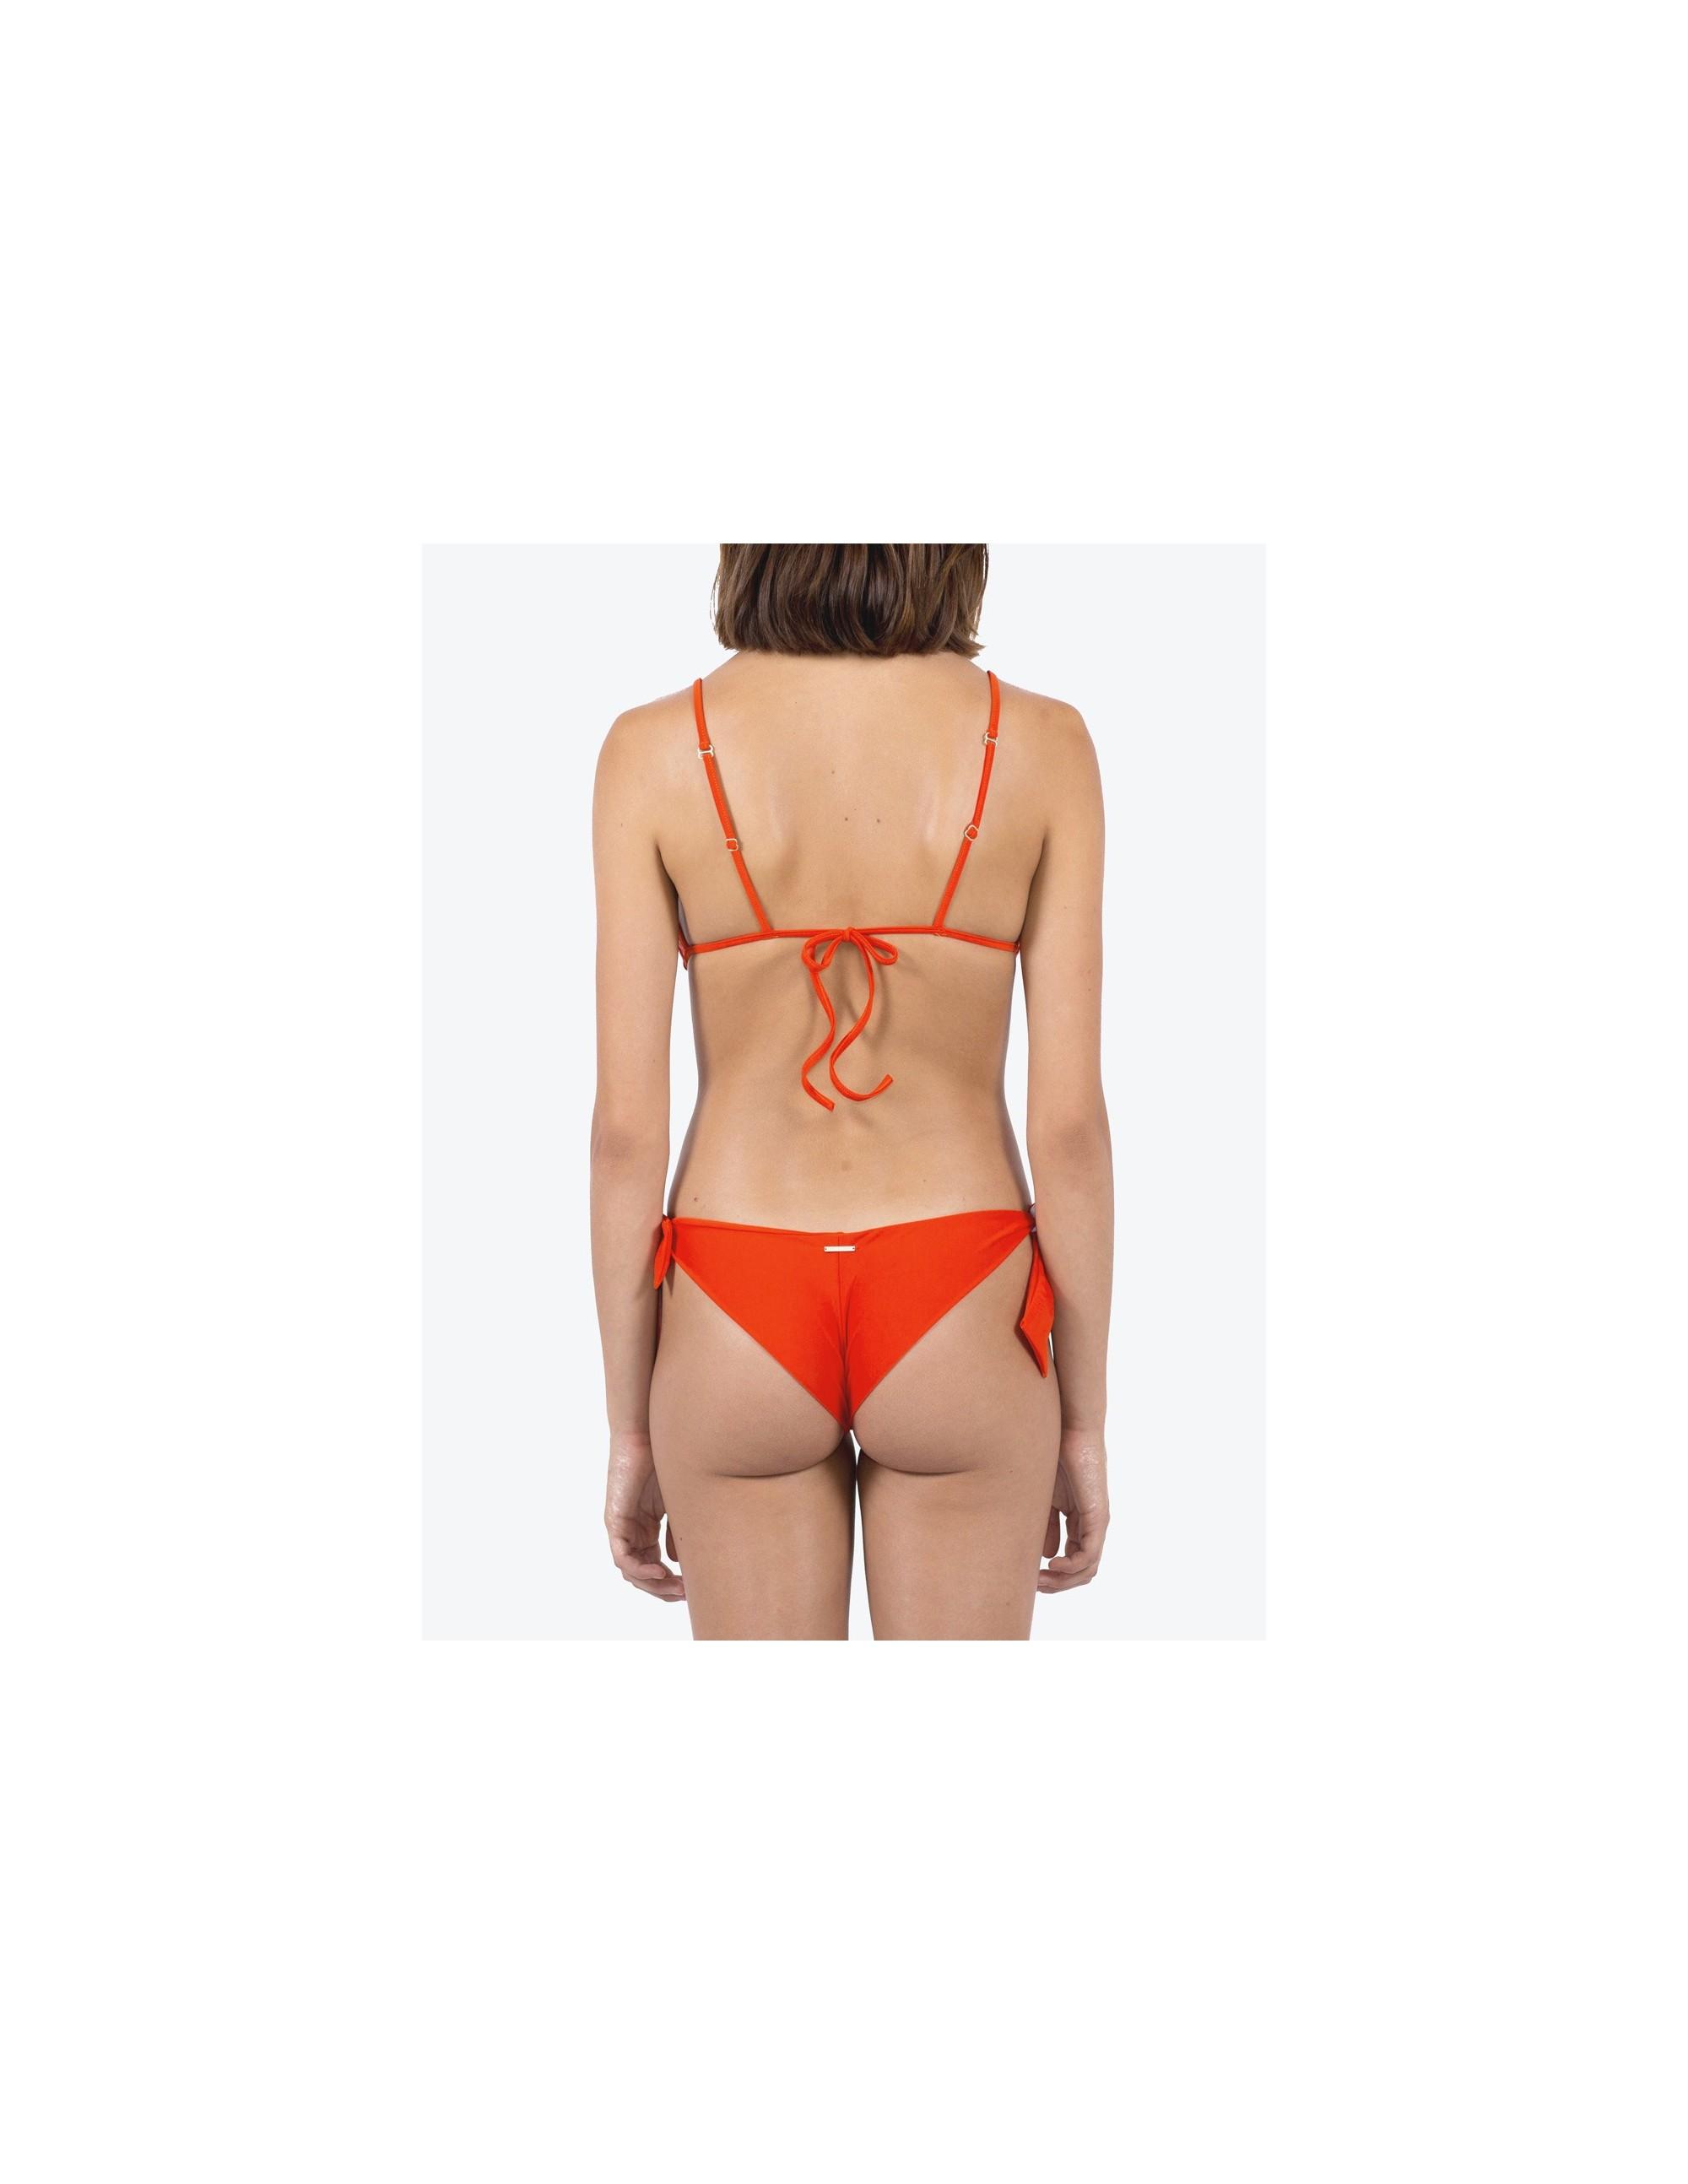 JAZ bikini top - CHARACTER RED